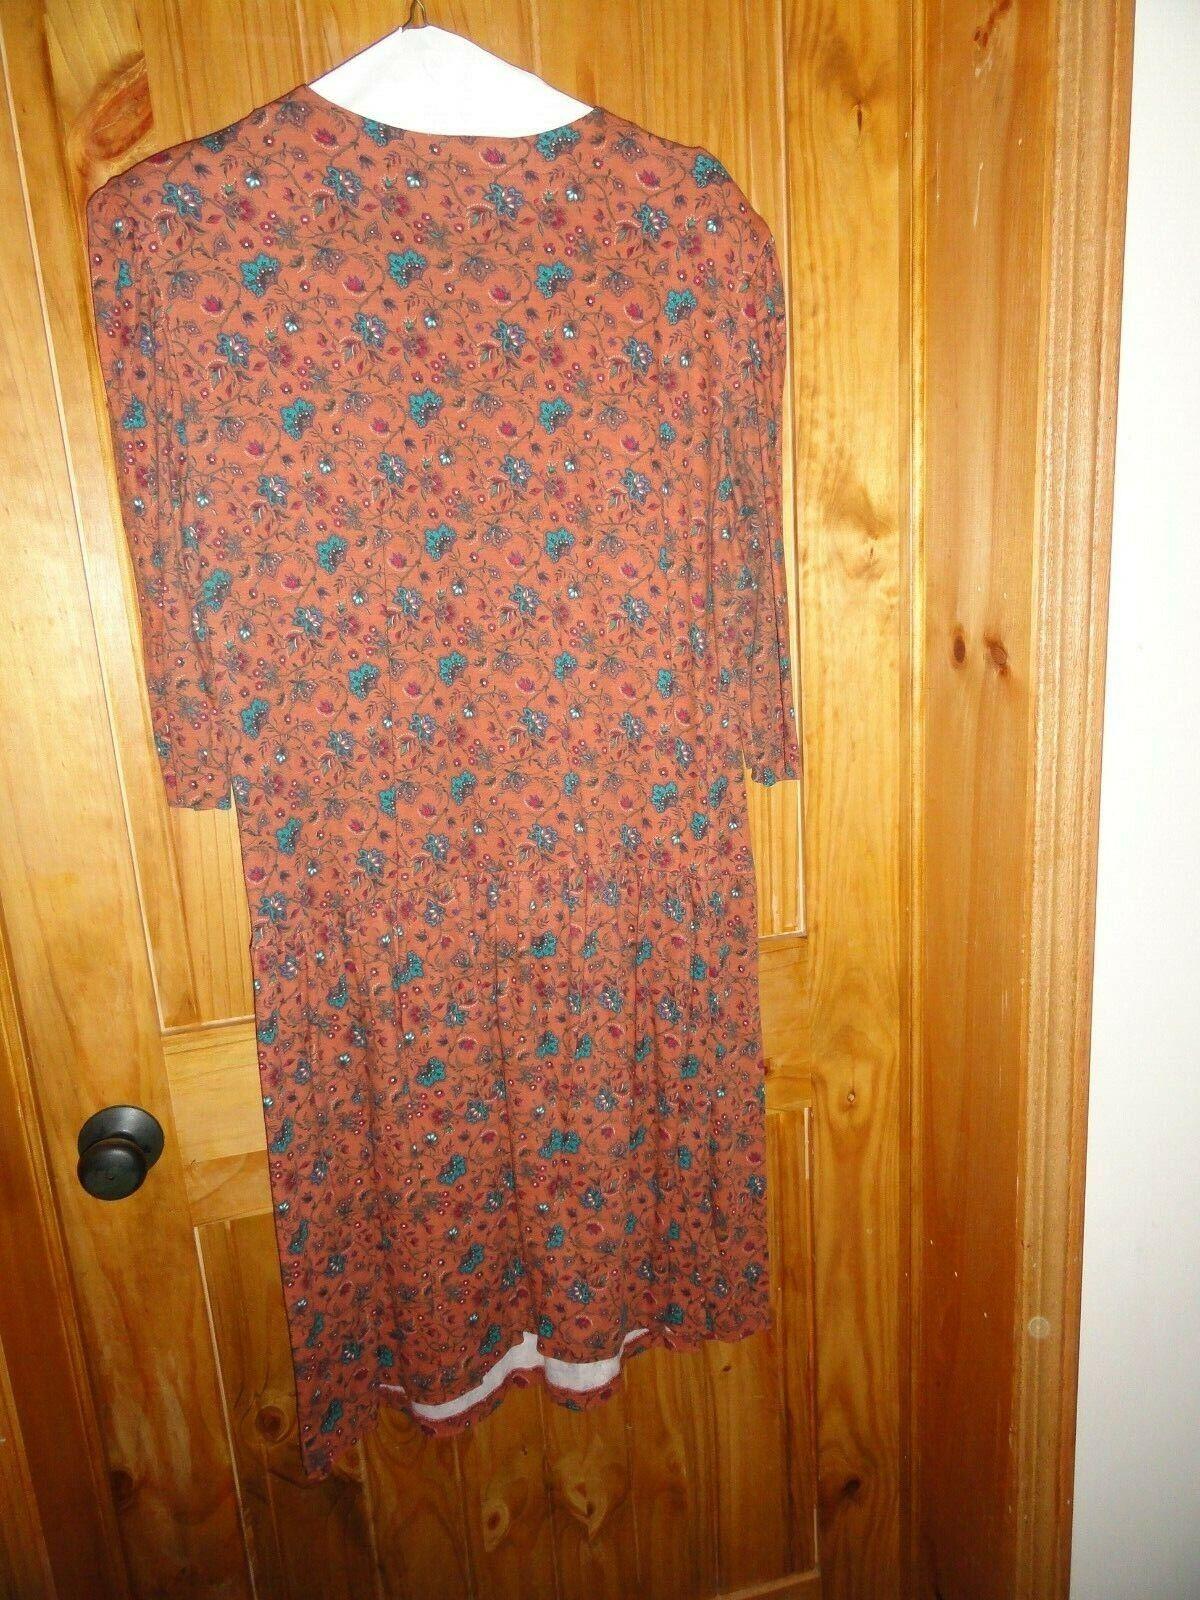 Woman's Venezia Dress Size 28W Rust/Turquoise - image 2